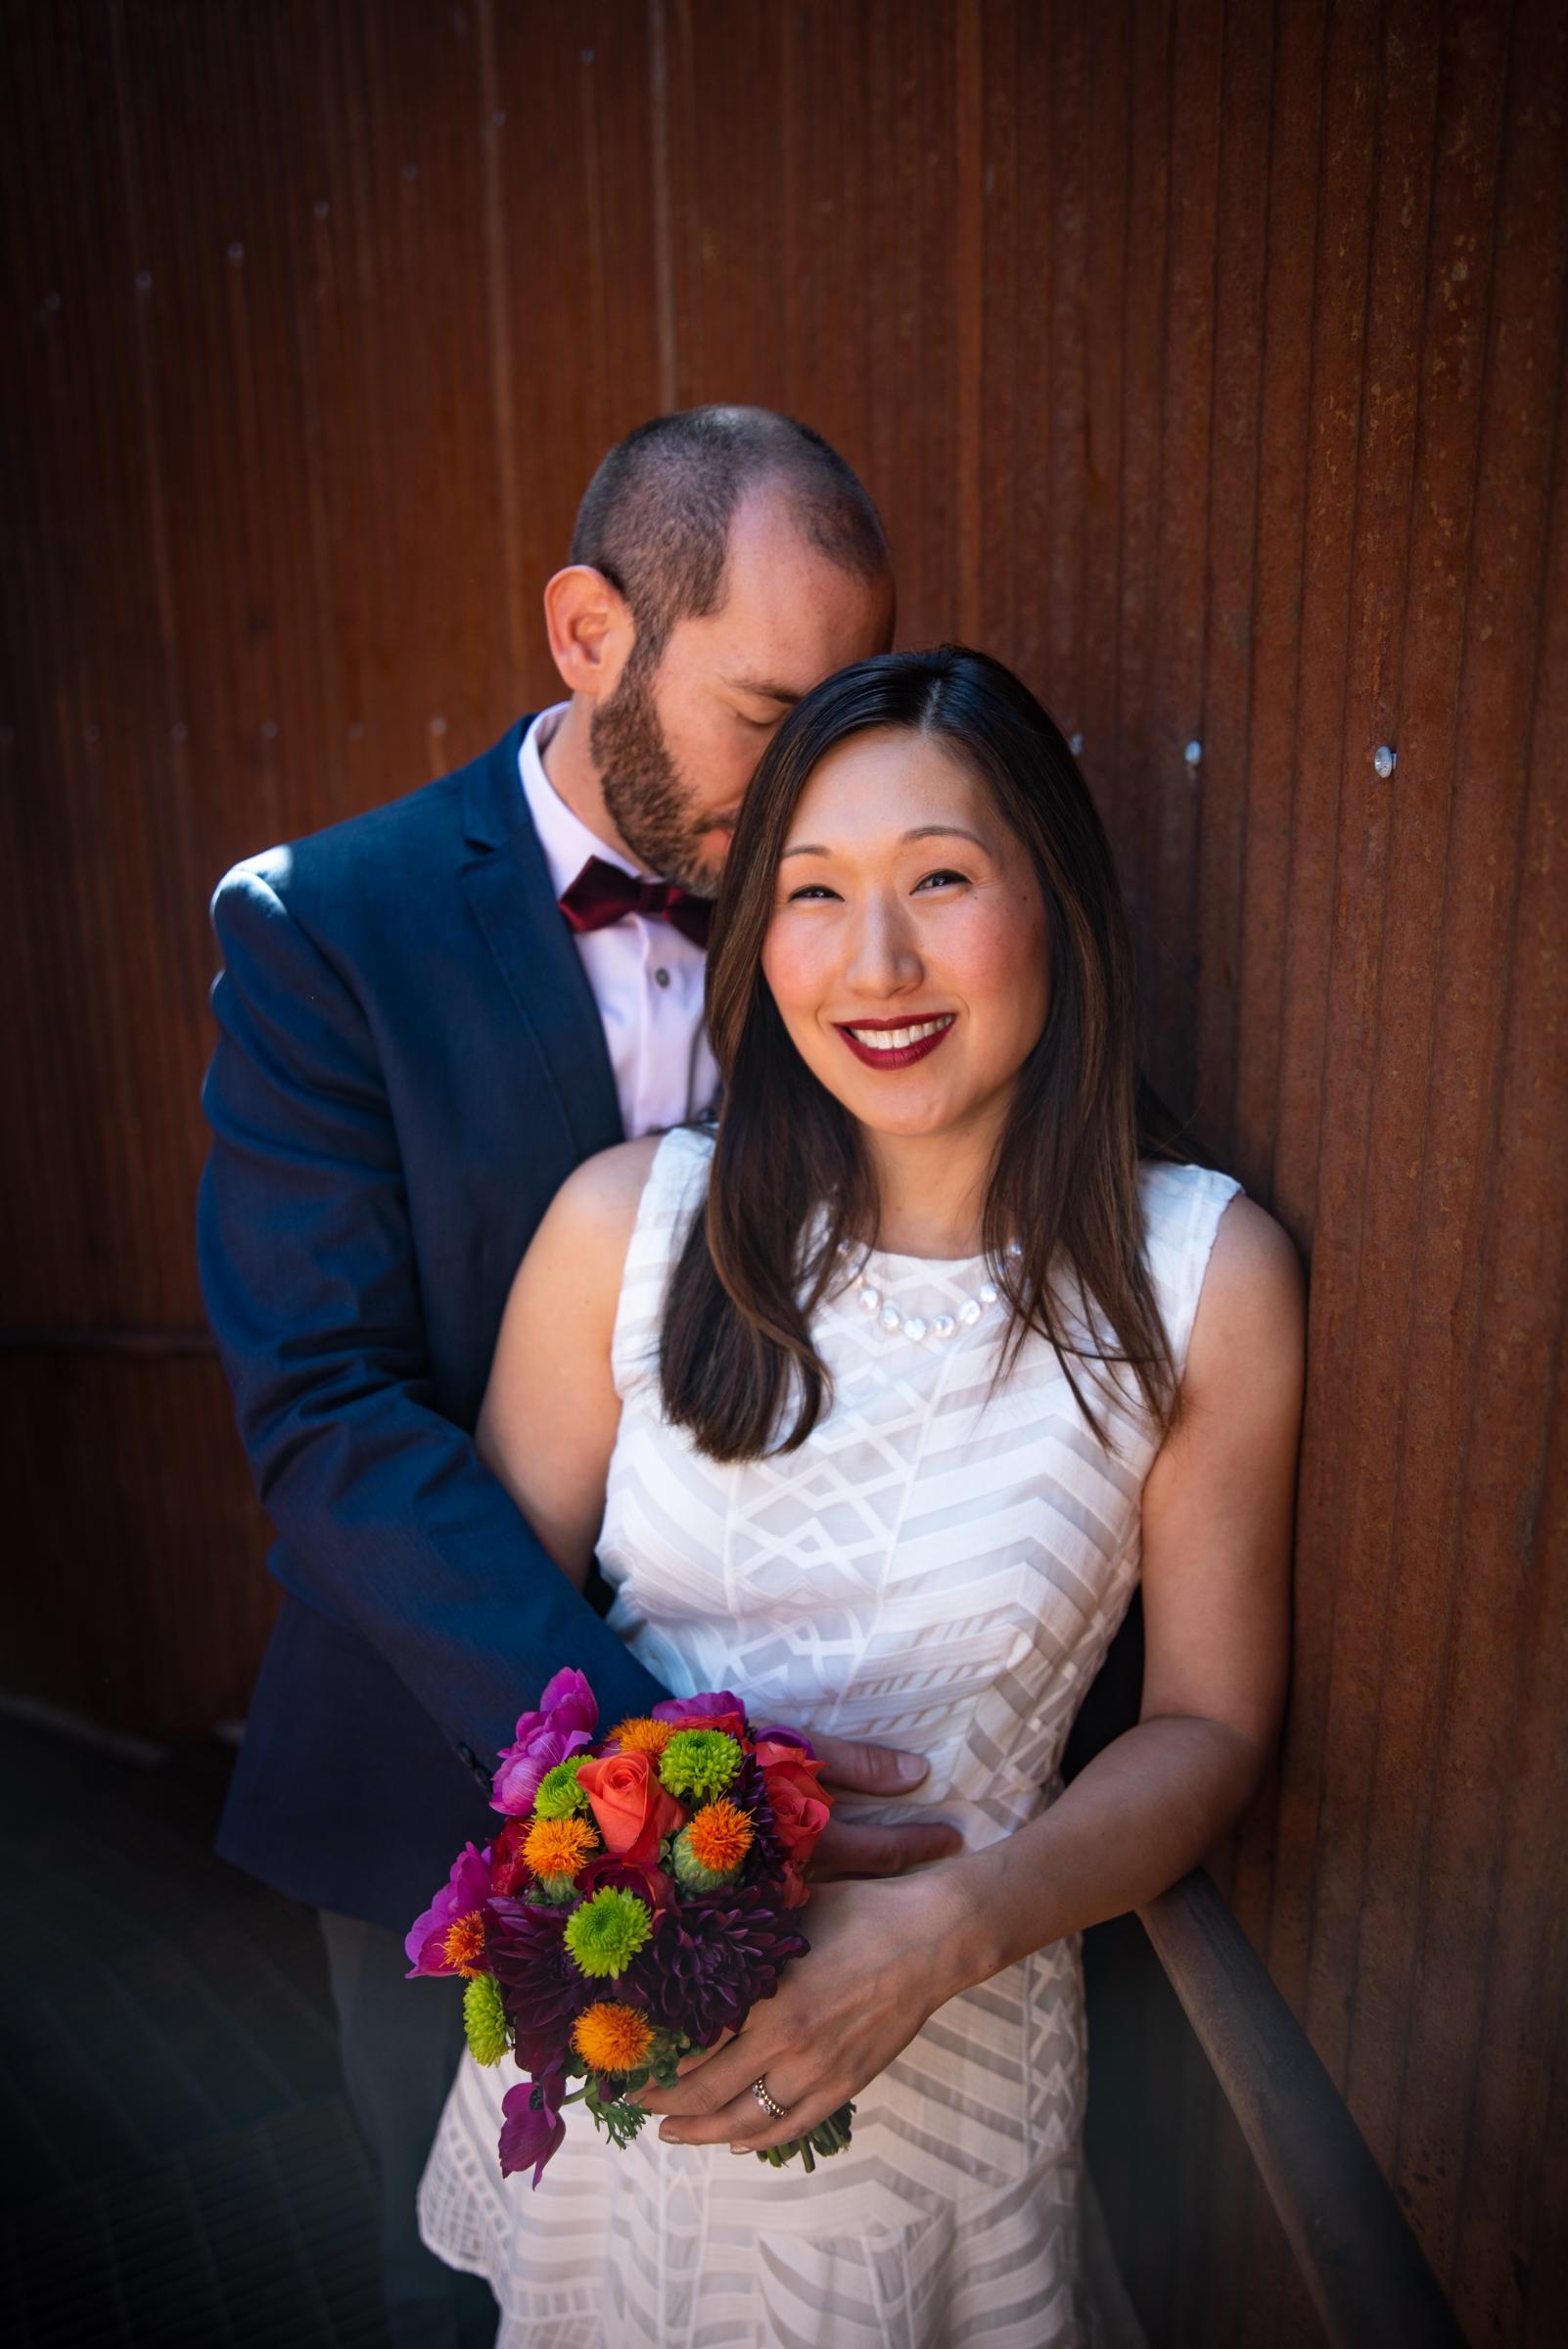 Elopement or Small Wedding Photography // Monika B. Leopold Photography // Durango, Colorado